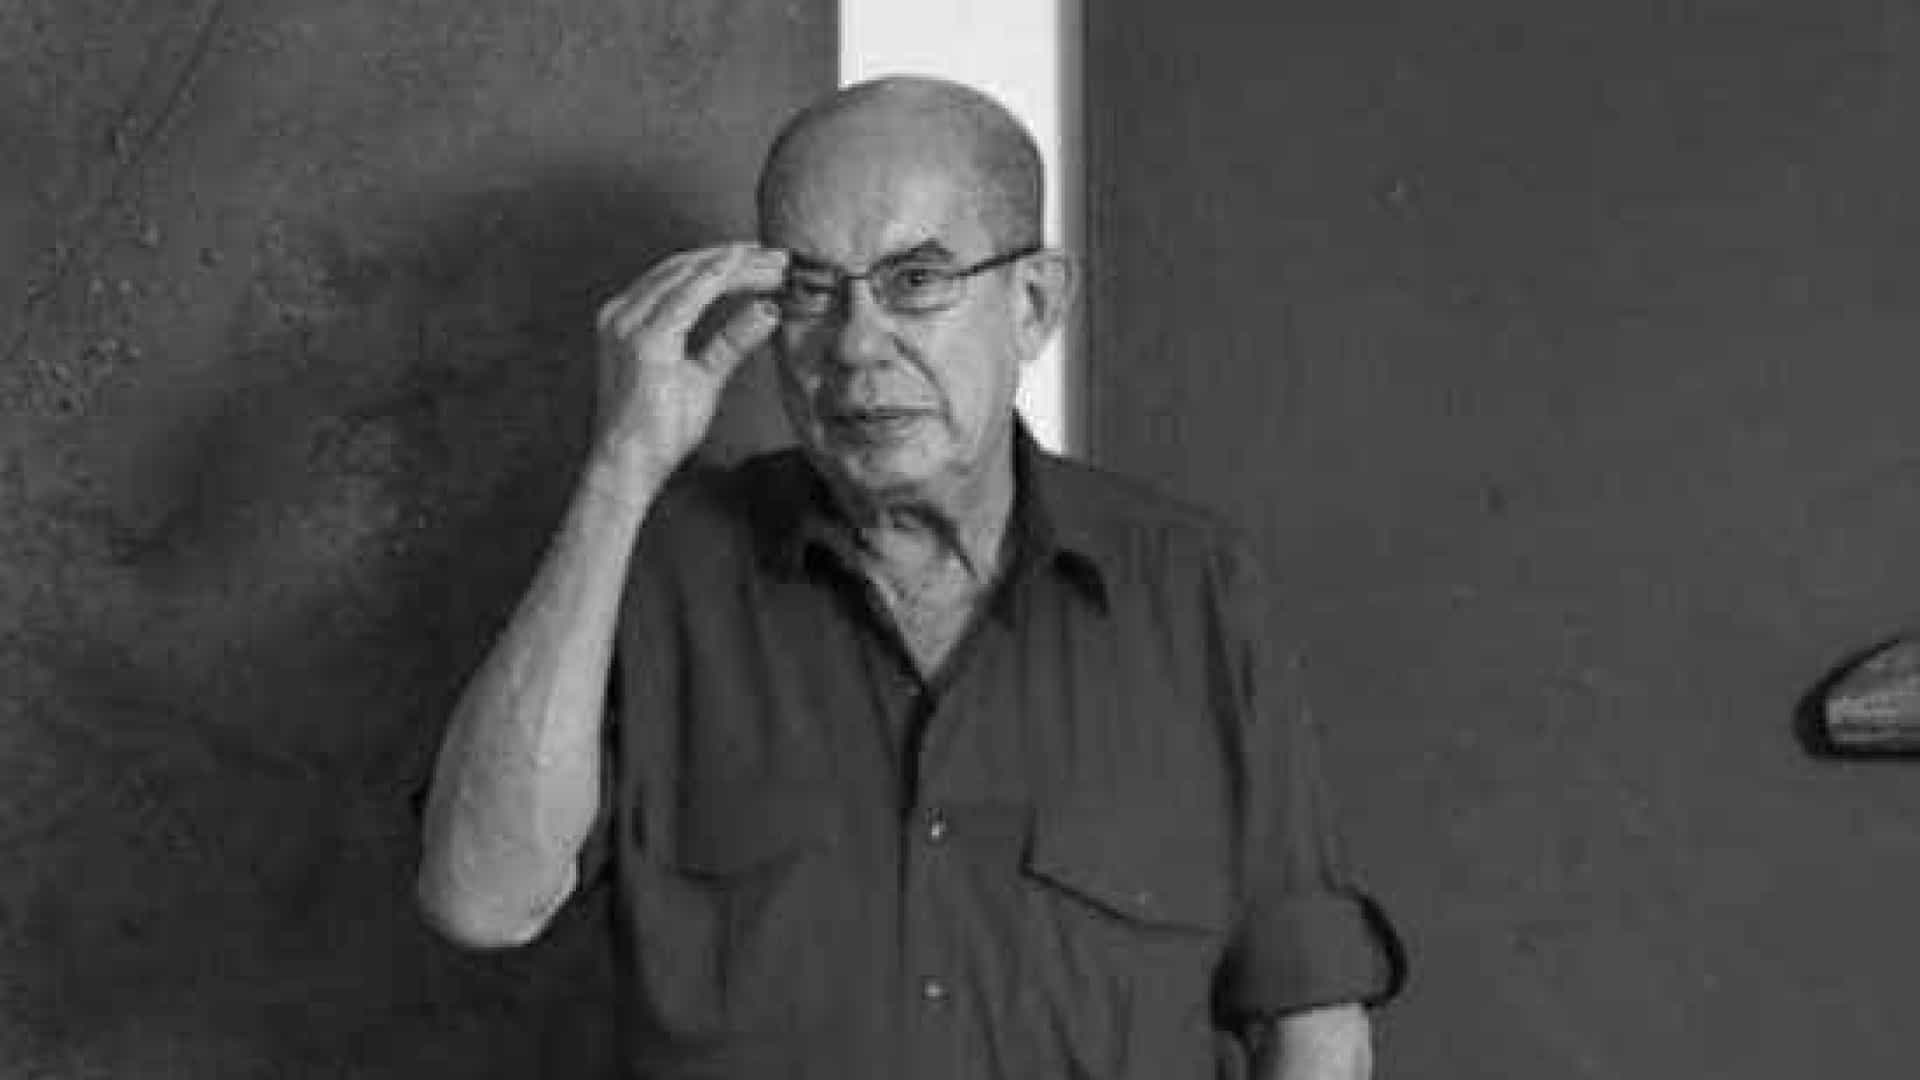 Morre artista plástico paraibano Antonio Dias aos 74 anos